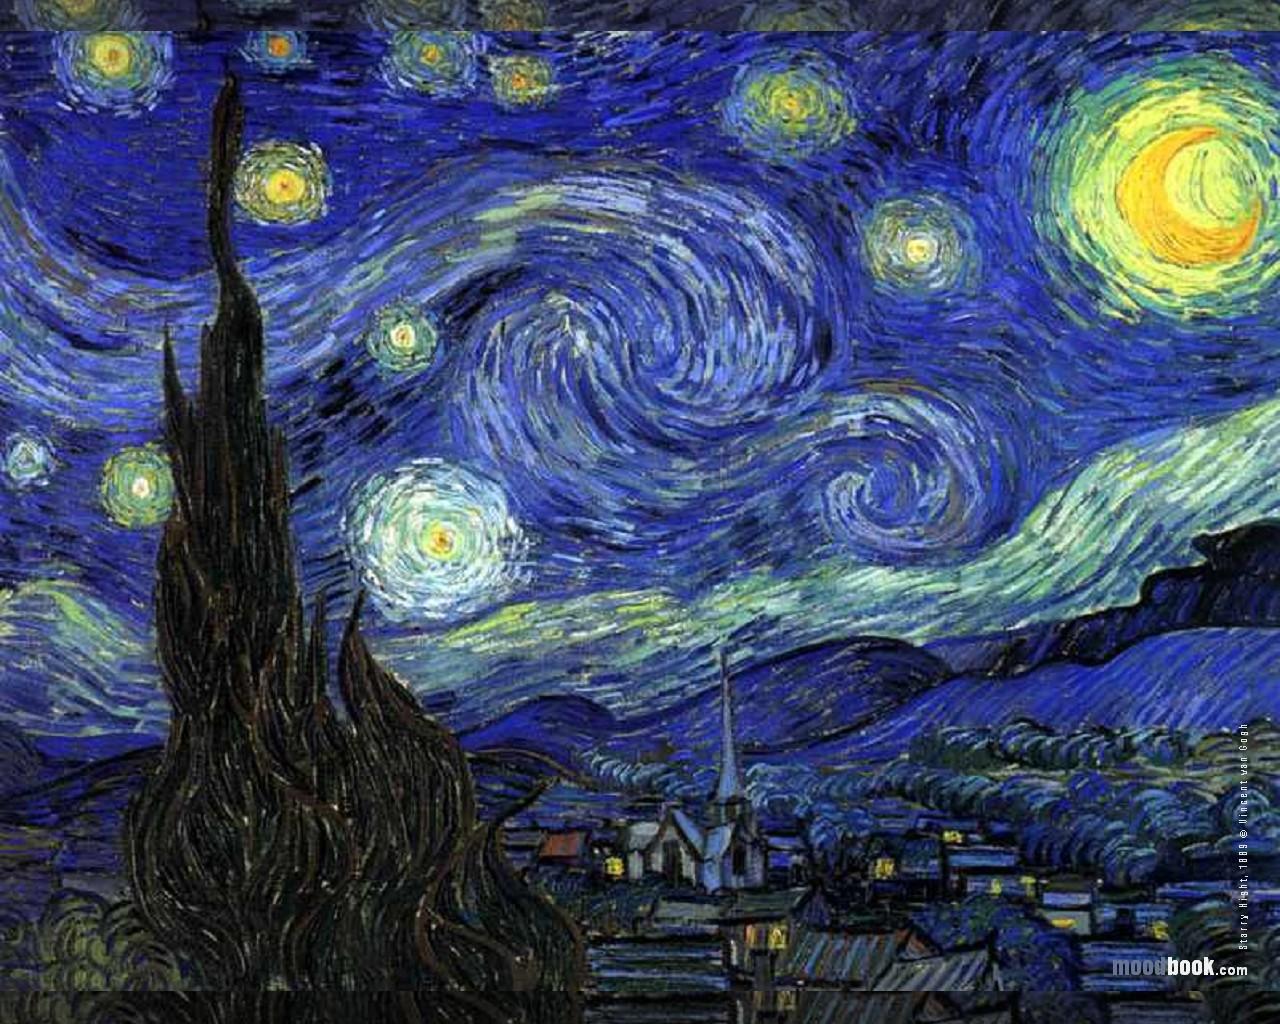 Part 1 The Proper Approach vincent van gogh wallpaper starry night 1280x1024